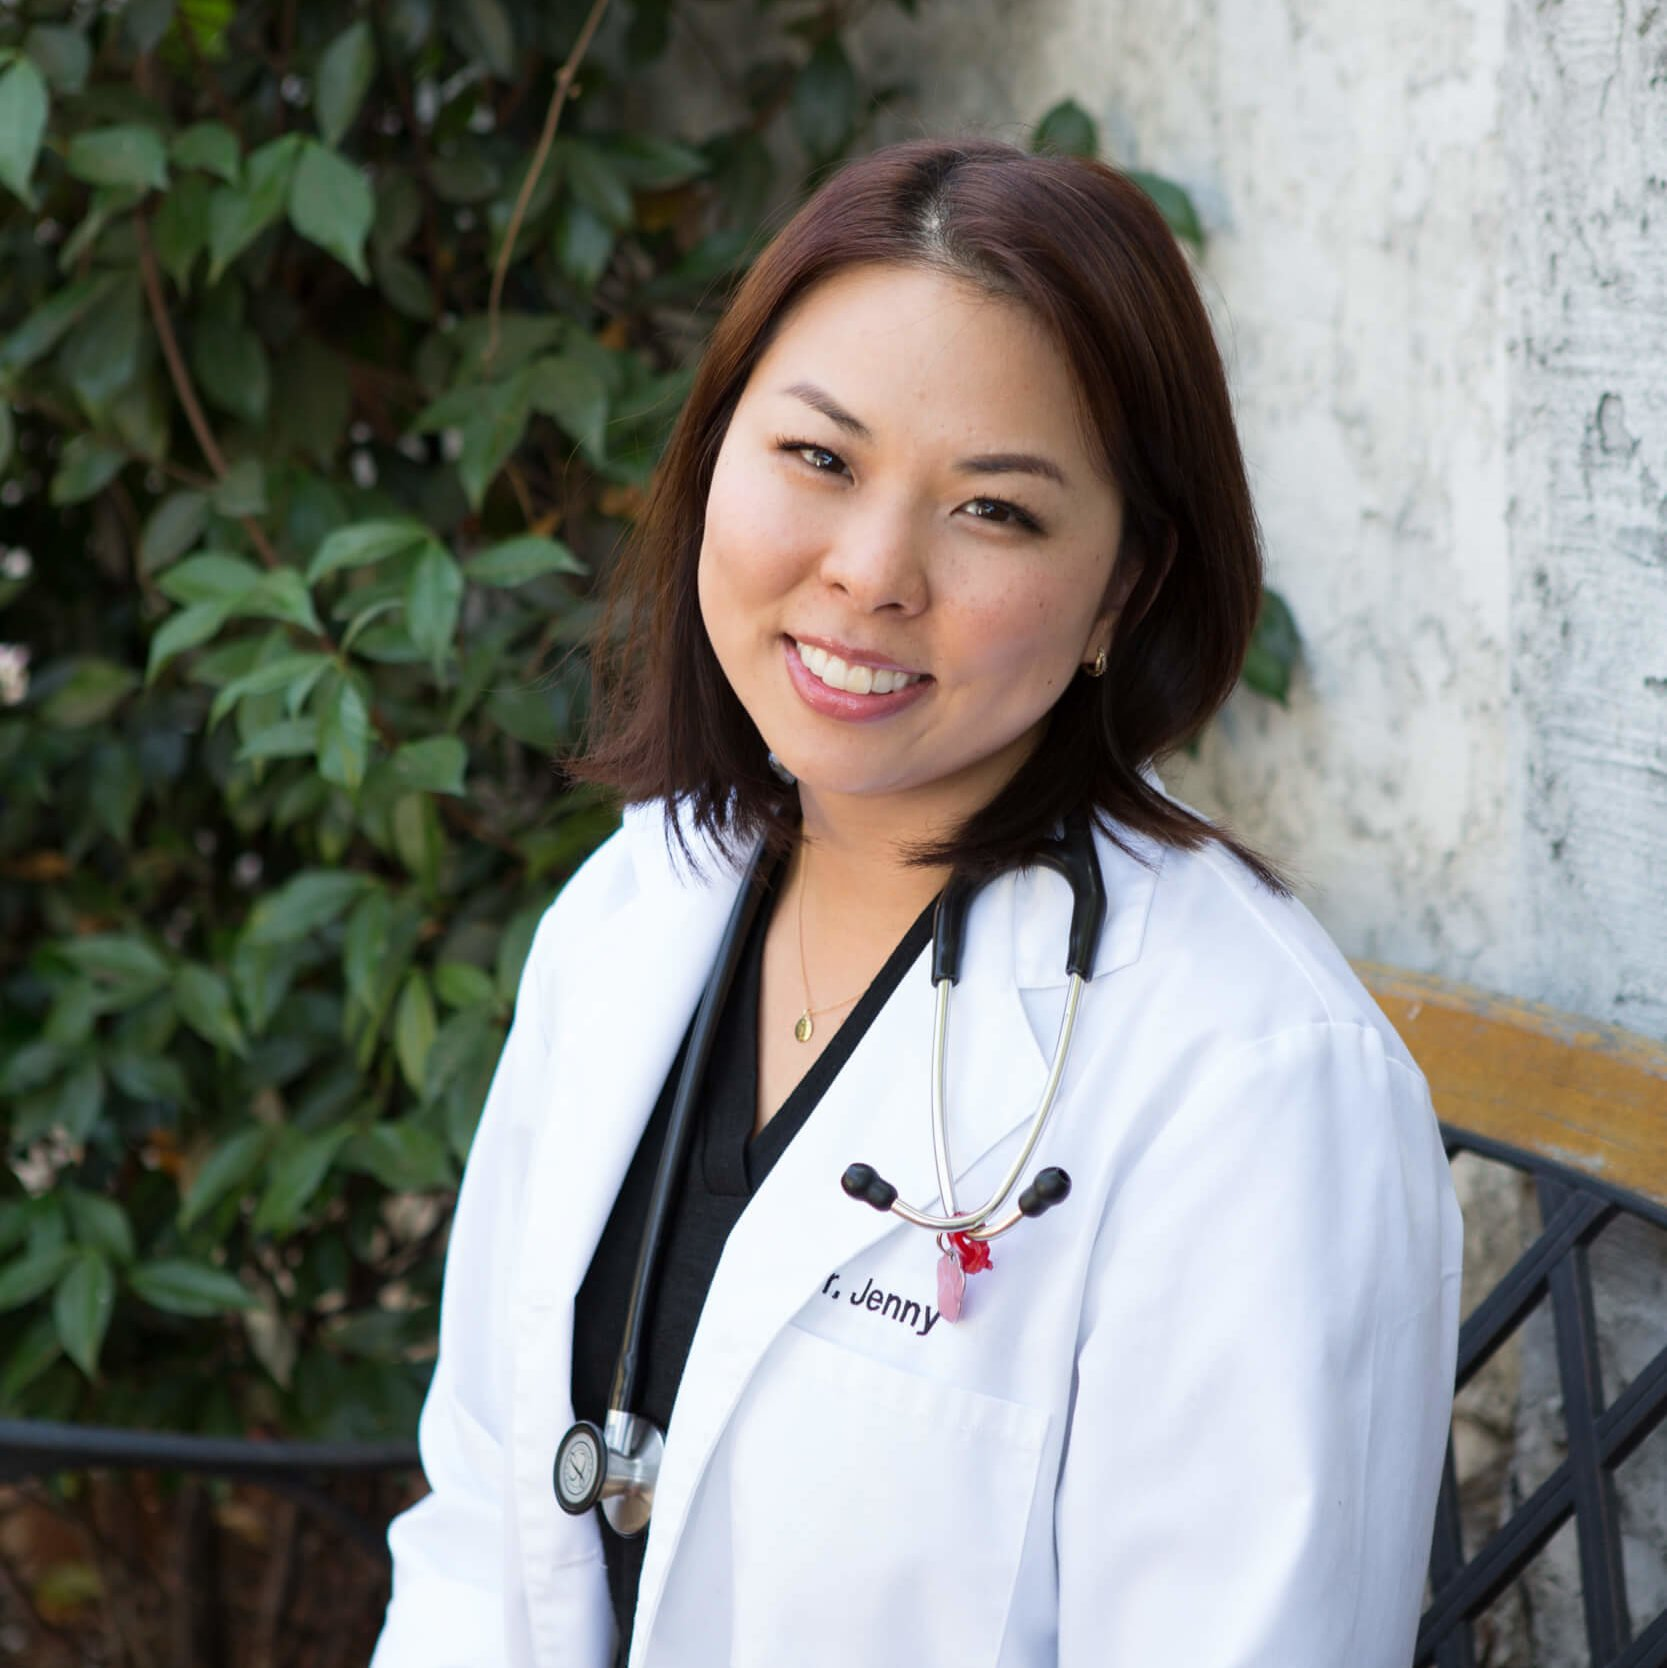 Team member Dr. Jenny Hsu